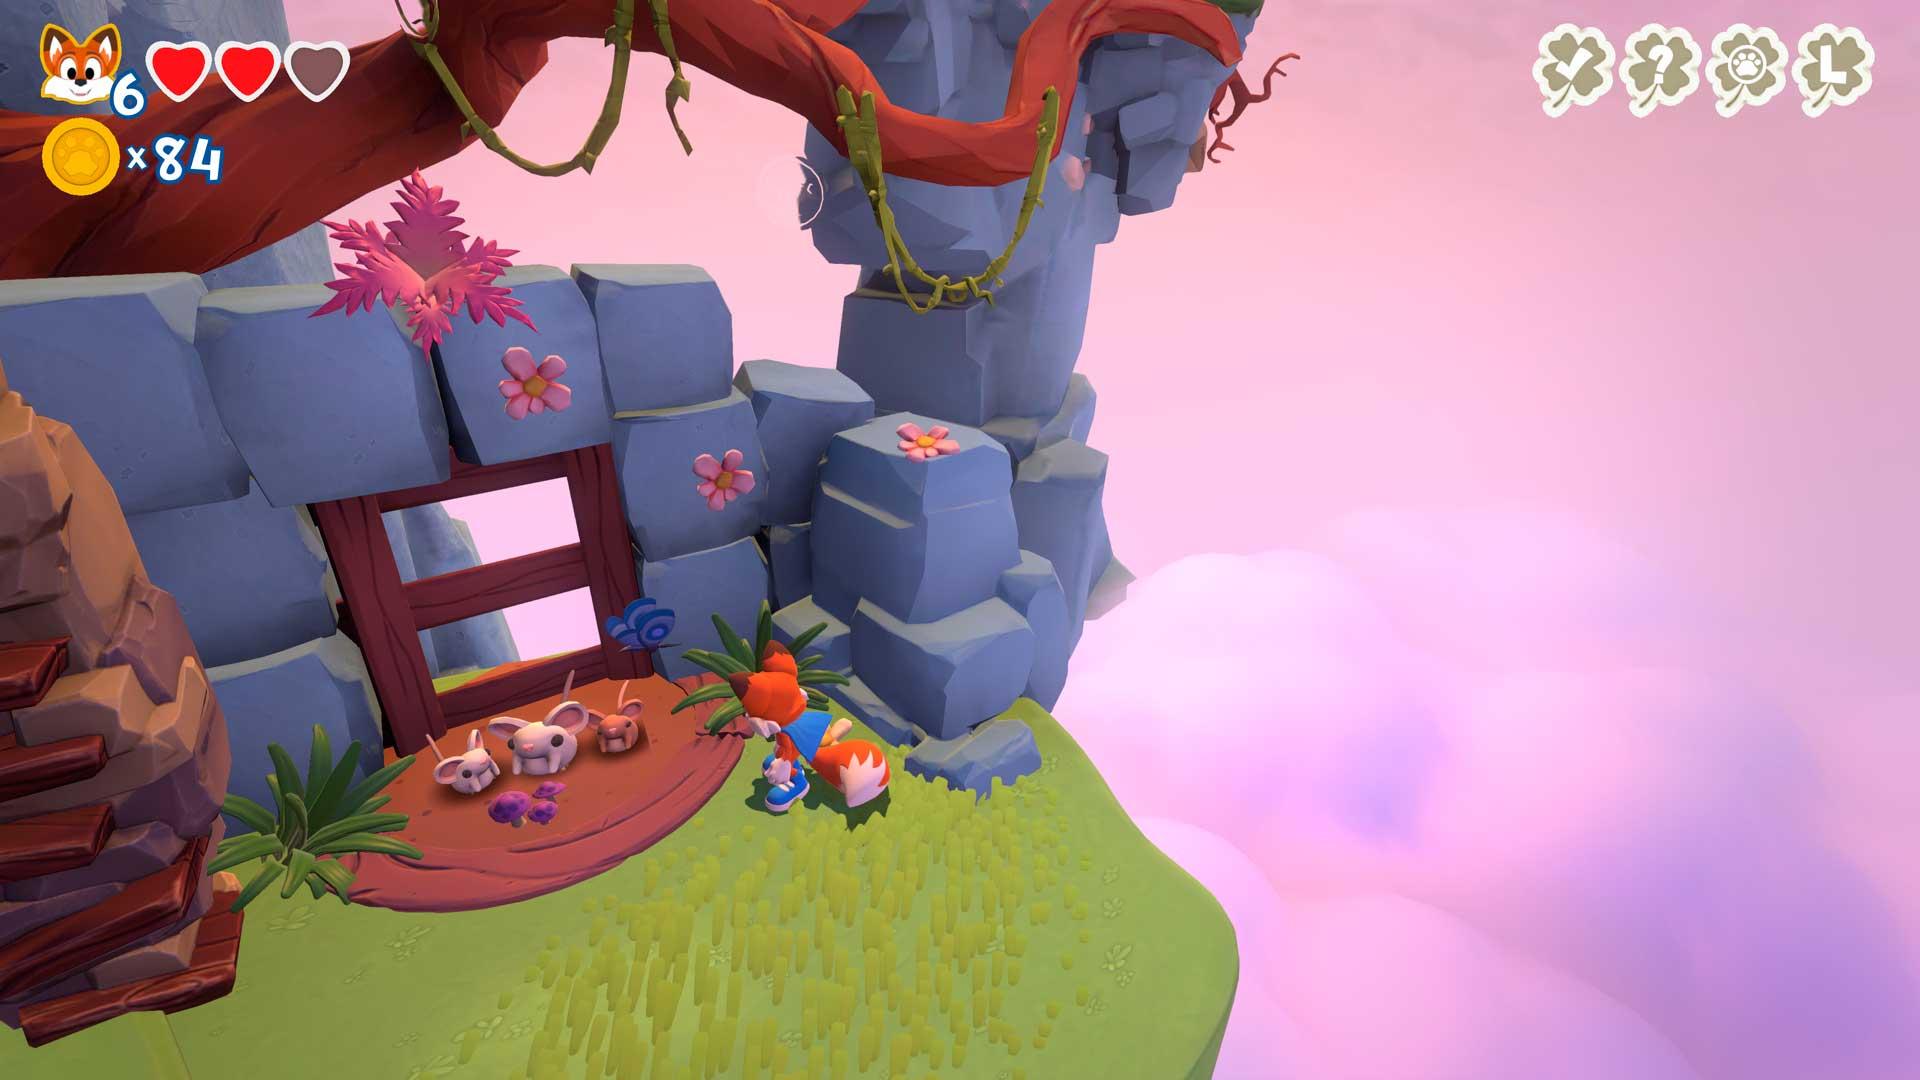 Análisis de Super Lucky's Tale - Xbox One X 4